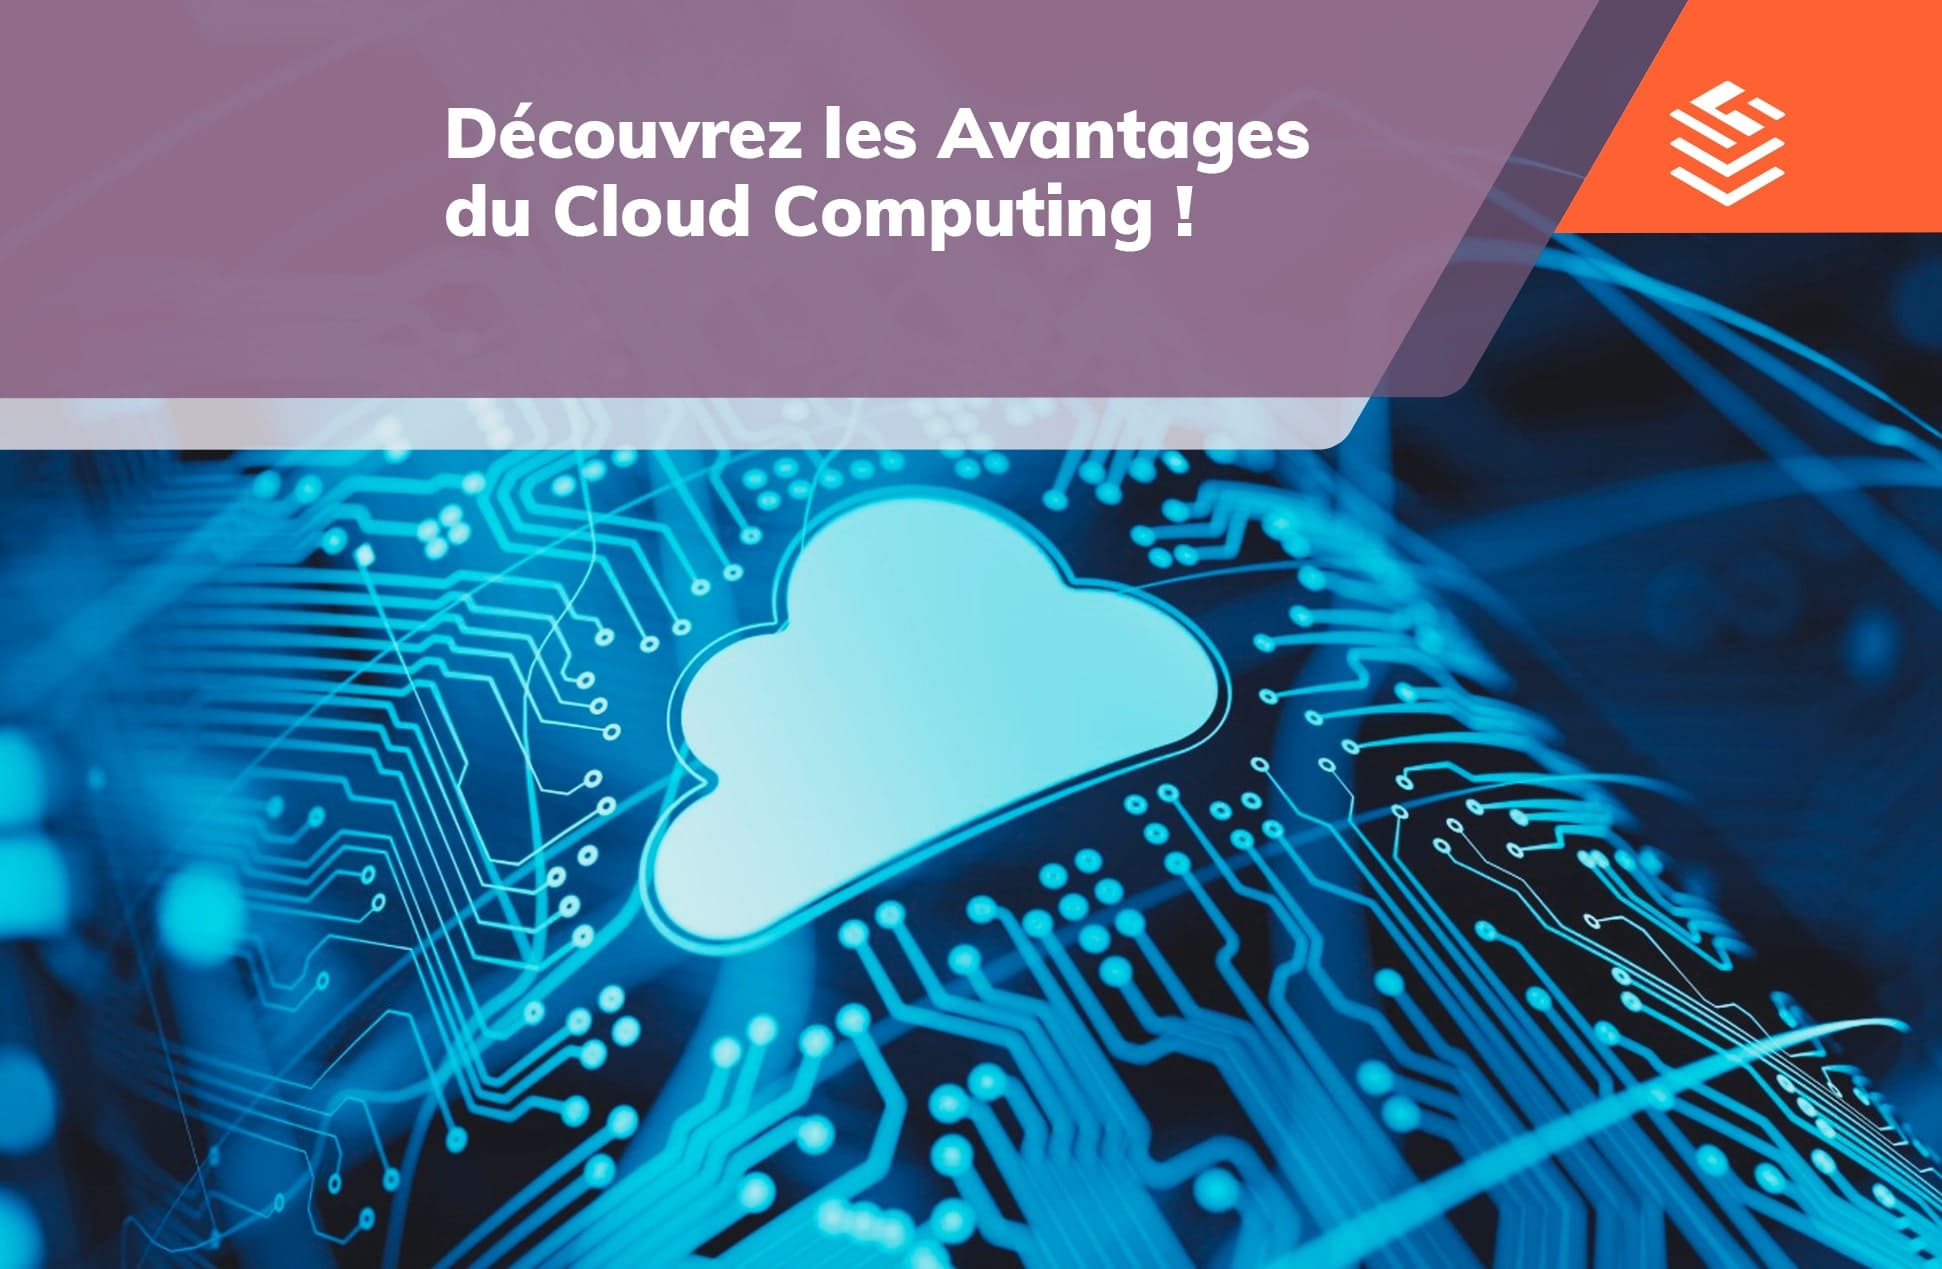 IT Outsourcing Informatique Oursourcing Avantages Cloud Computing FR 13 min